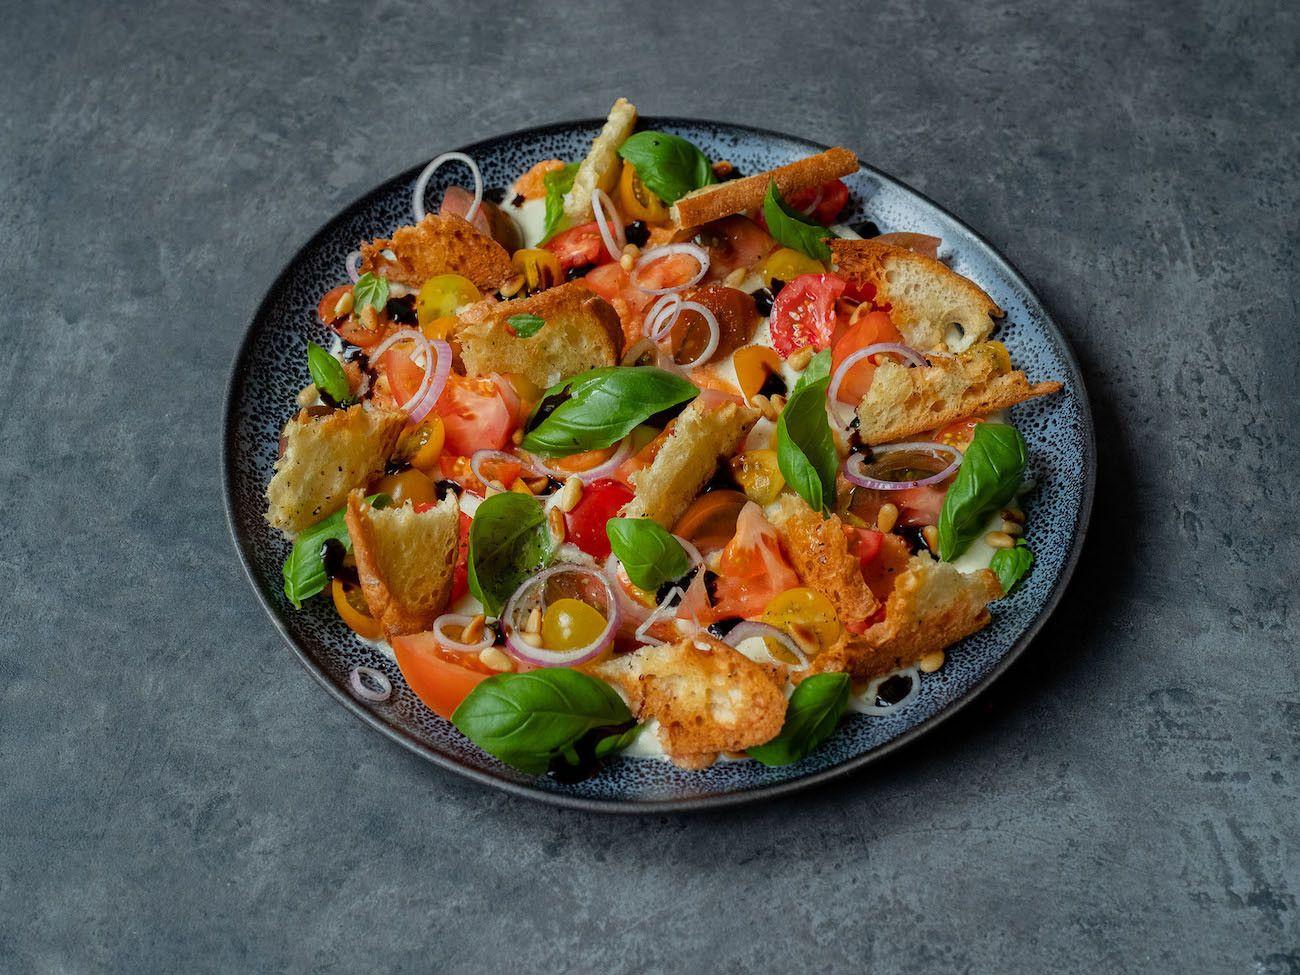 Foodblog, About Fuel, Rezept, Caprese Salat, Mozzarella, Balsamico, Pinienkerne